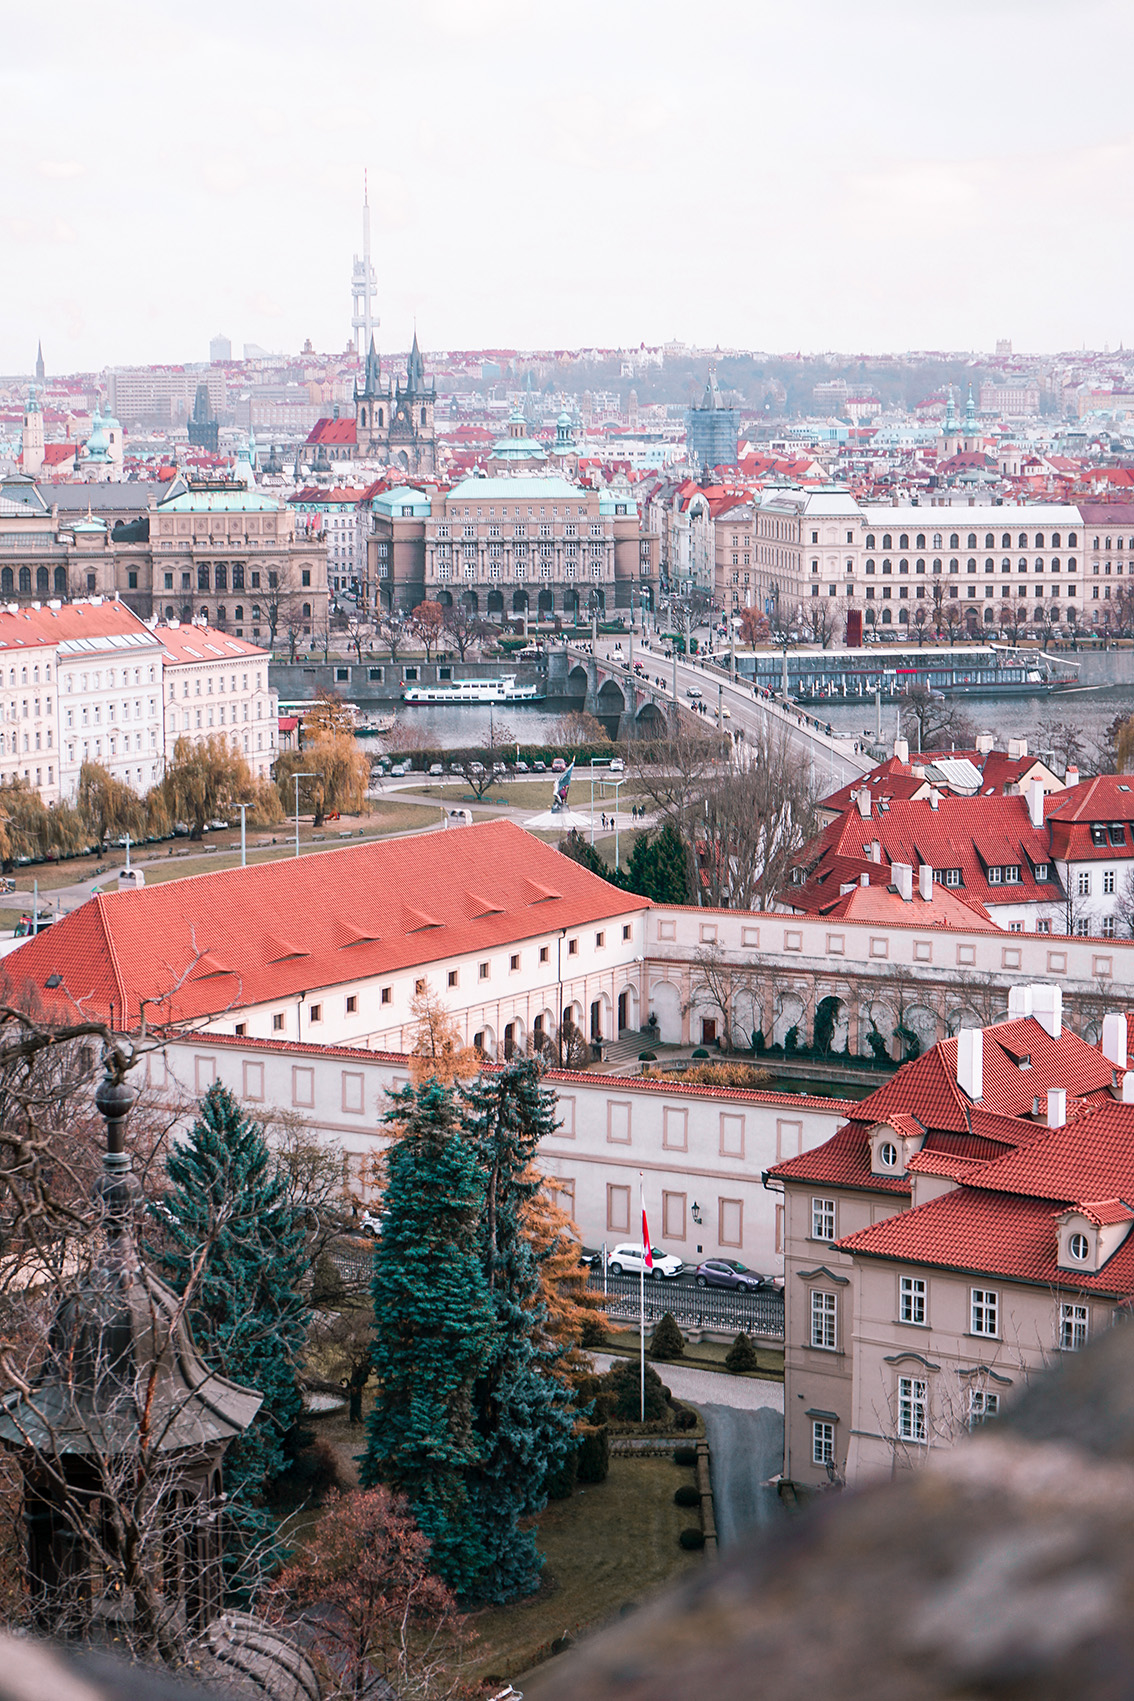 2-2 Weekend a Praga: 7 cose da vedere, dove dormire, gli indirizzi food e i Mercatini di Natale più belli.